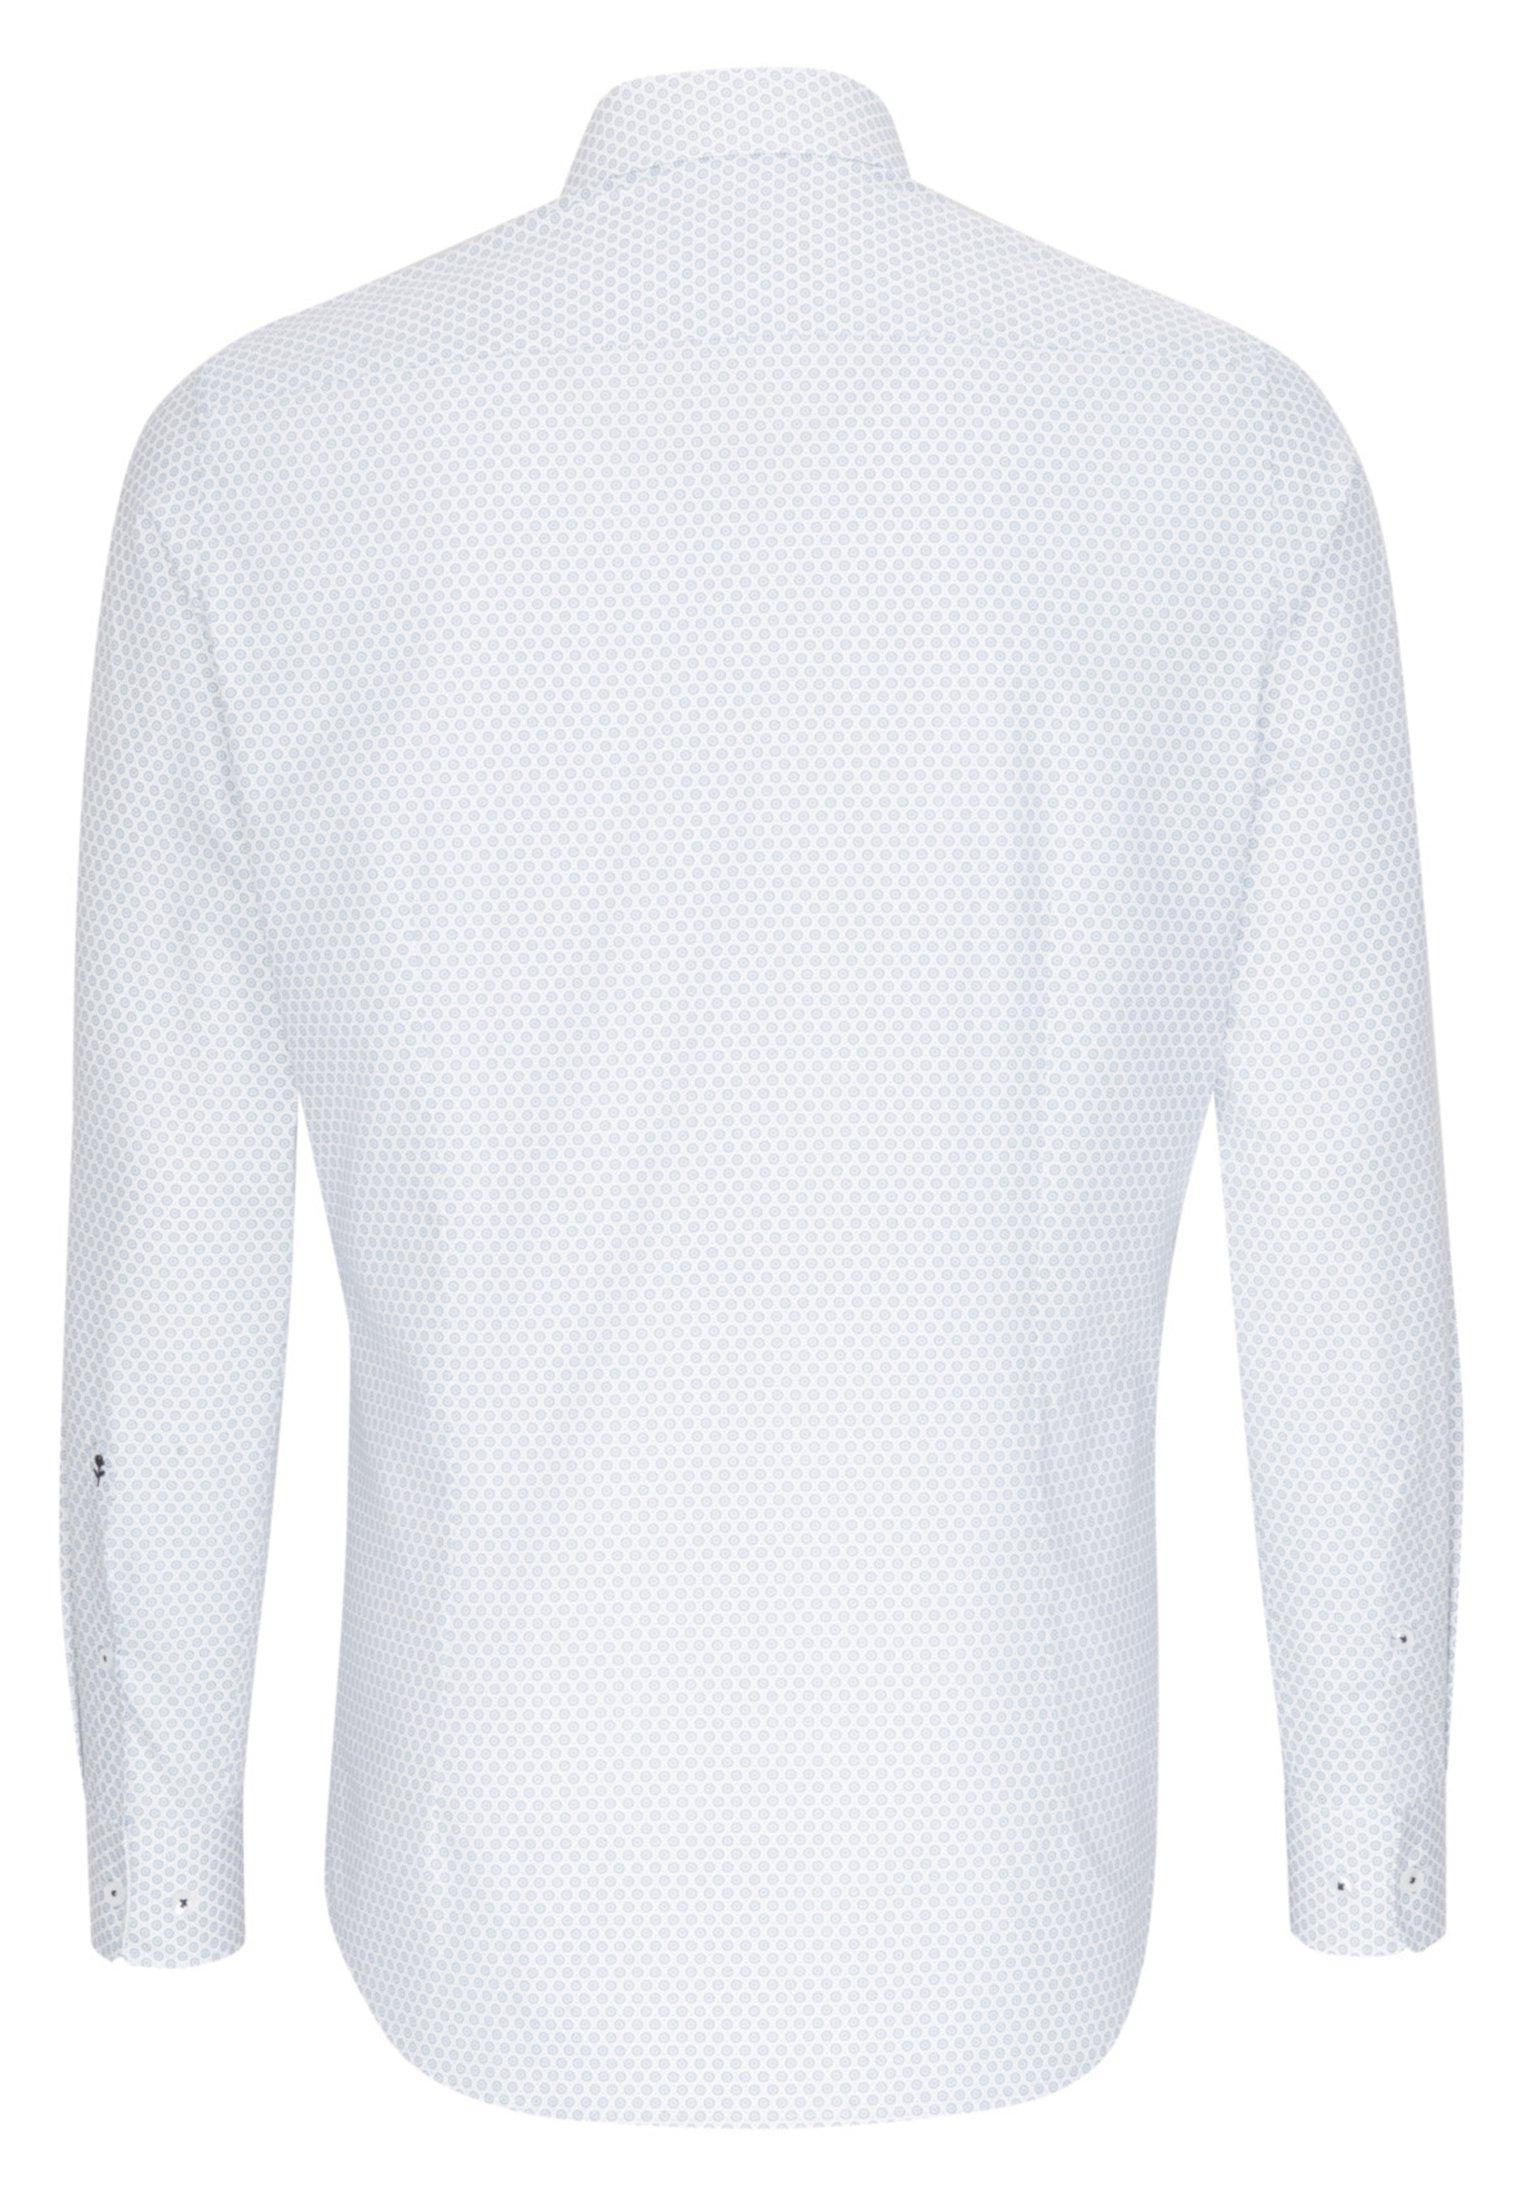 Seidensticker Slim Fit - Koszula Biznesowa Blau